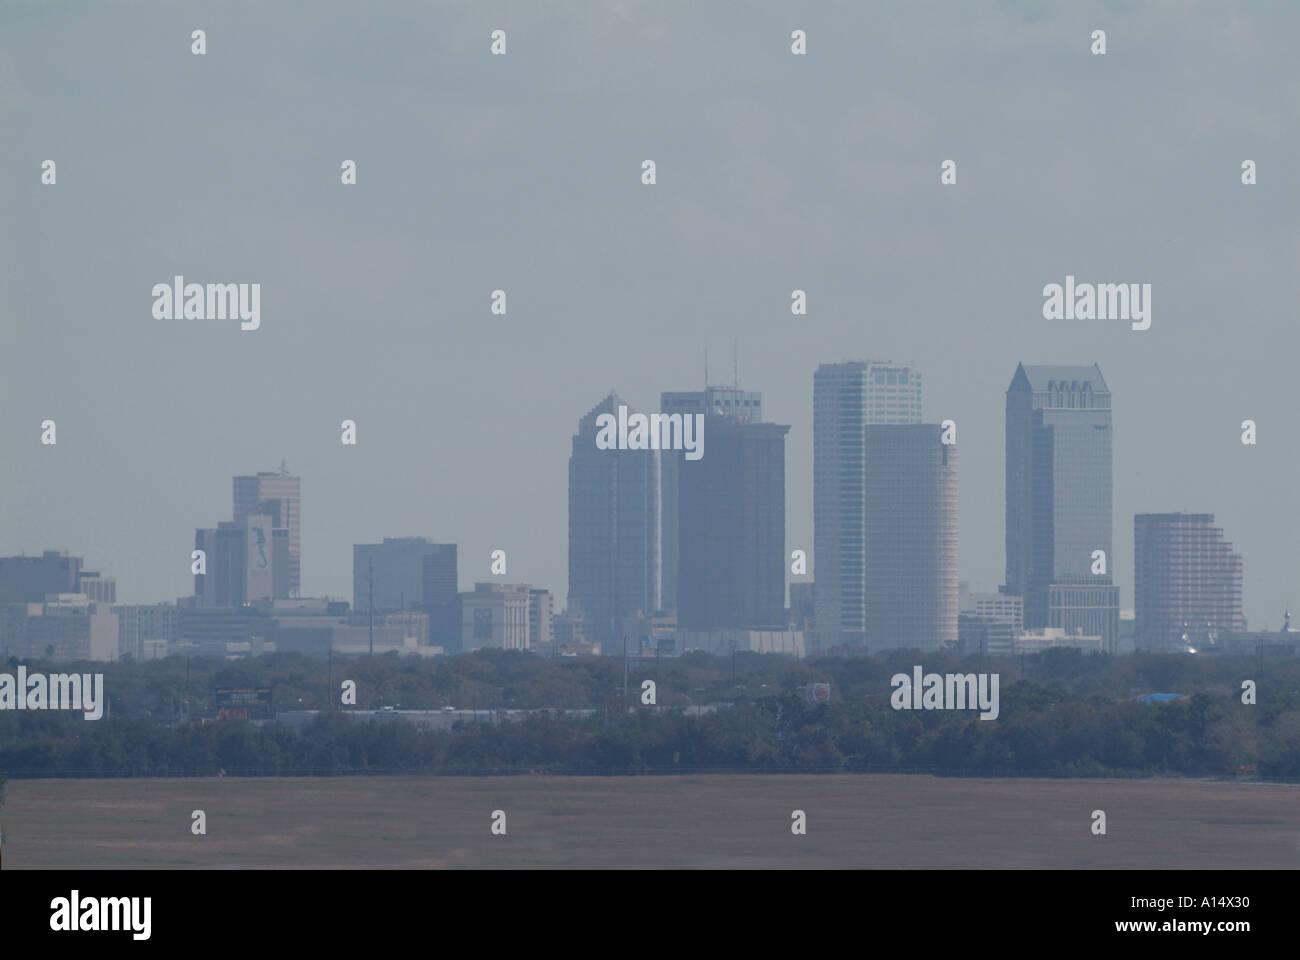 Haze and air pollution over Tampa Florida Stock Photo